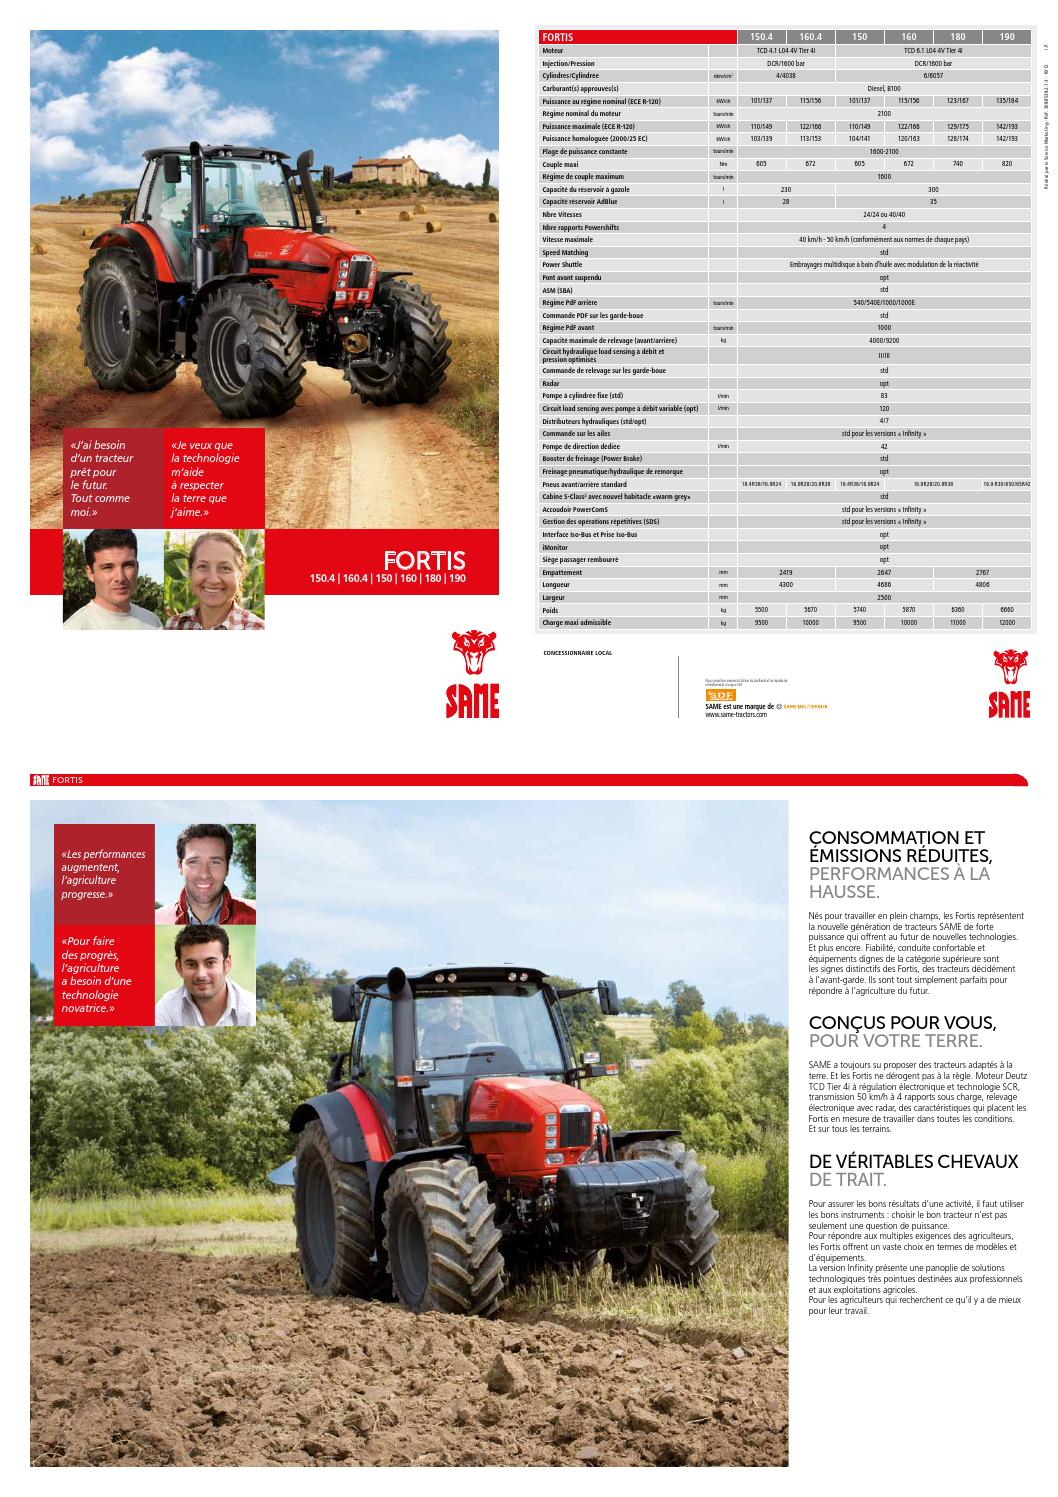 308 8538 2 1 3 fortis fr by same tractors issuu. Black Bedroom Furniture Sets. Home Design Ideas